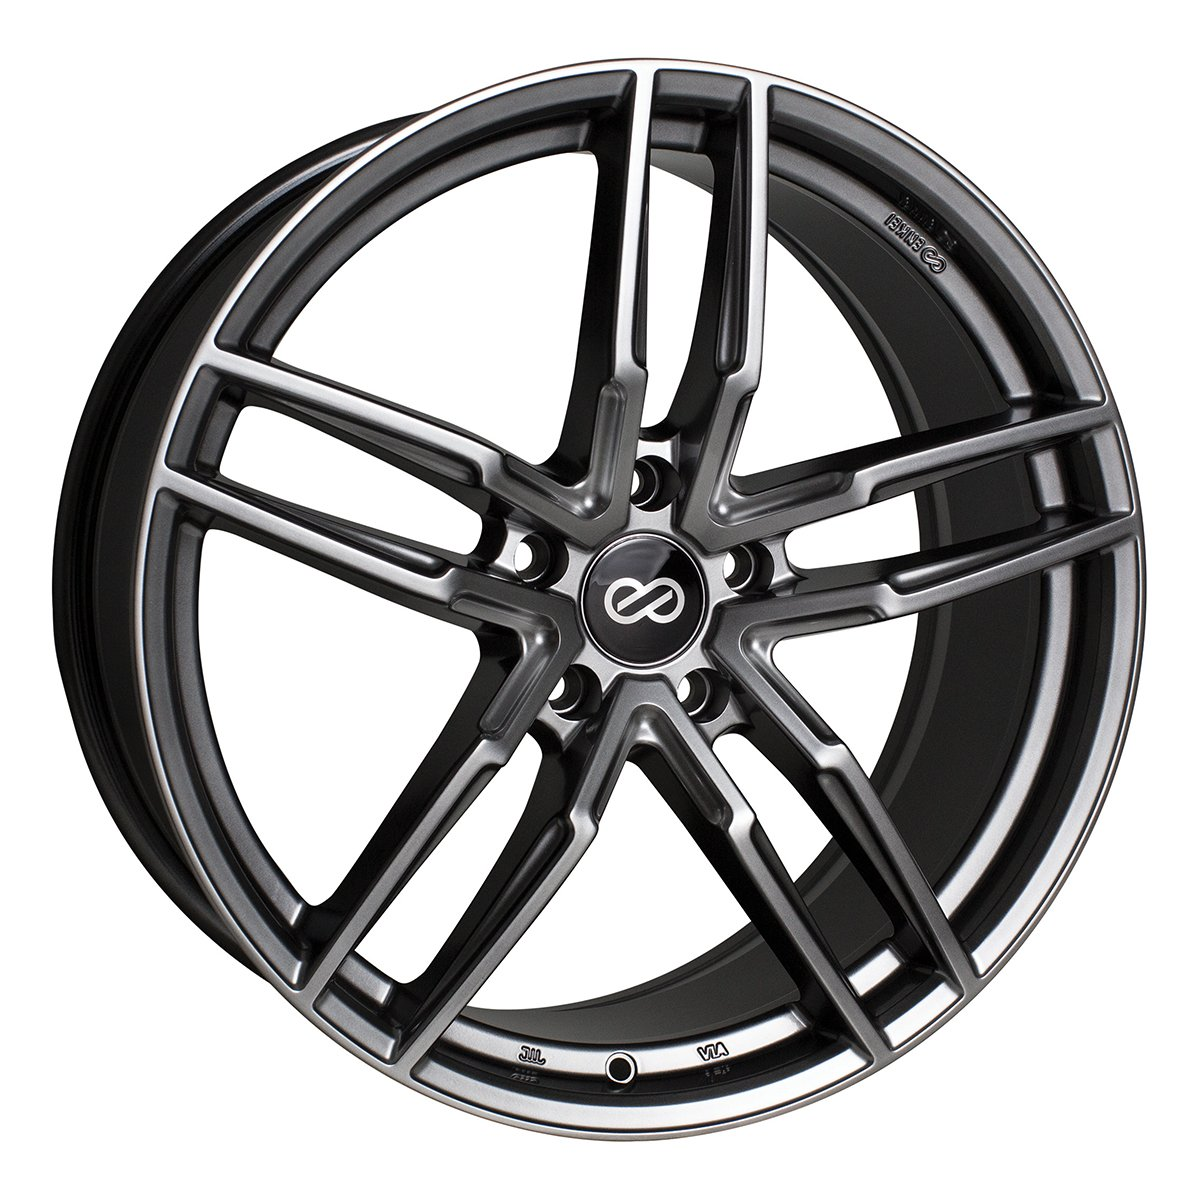 17'' Enkei SS05 Performance Wheel Rim Gray 17x7.5 5x114.3 +40 511-775-6540GR